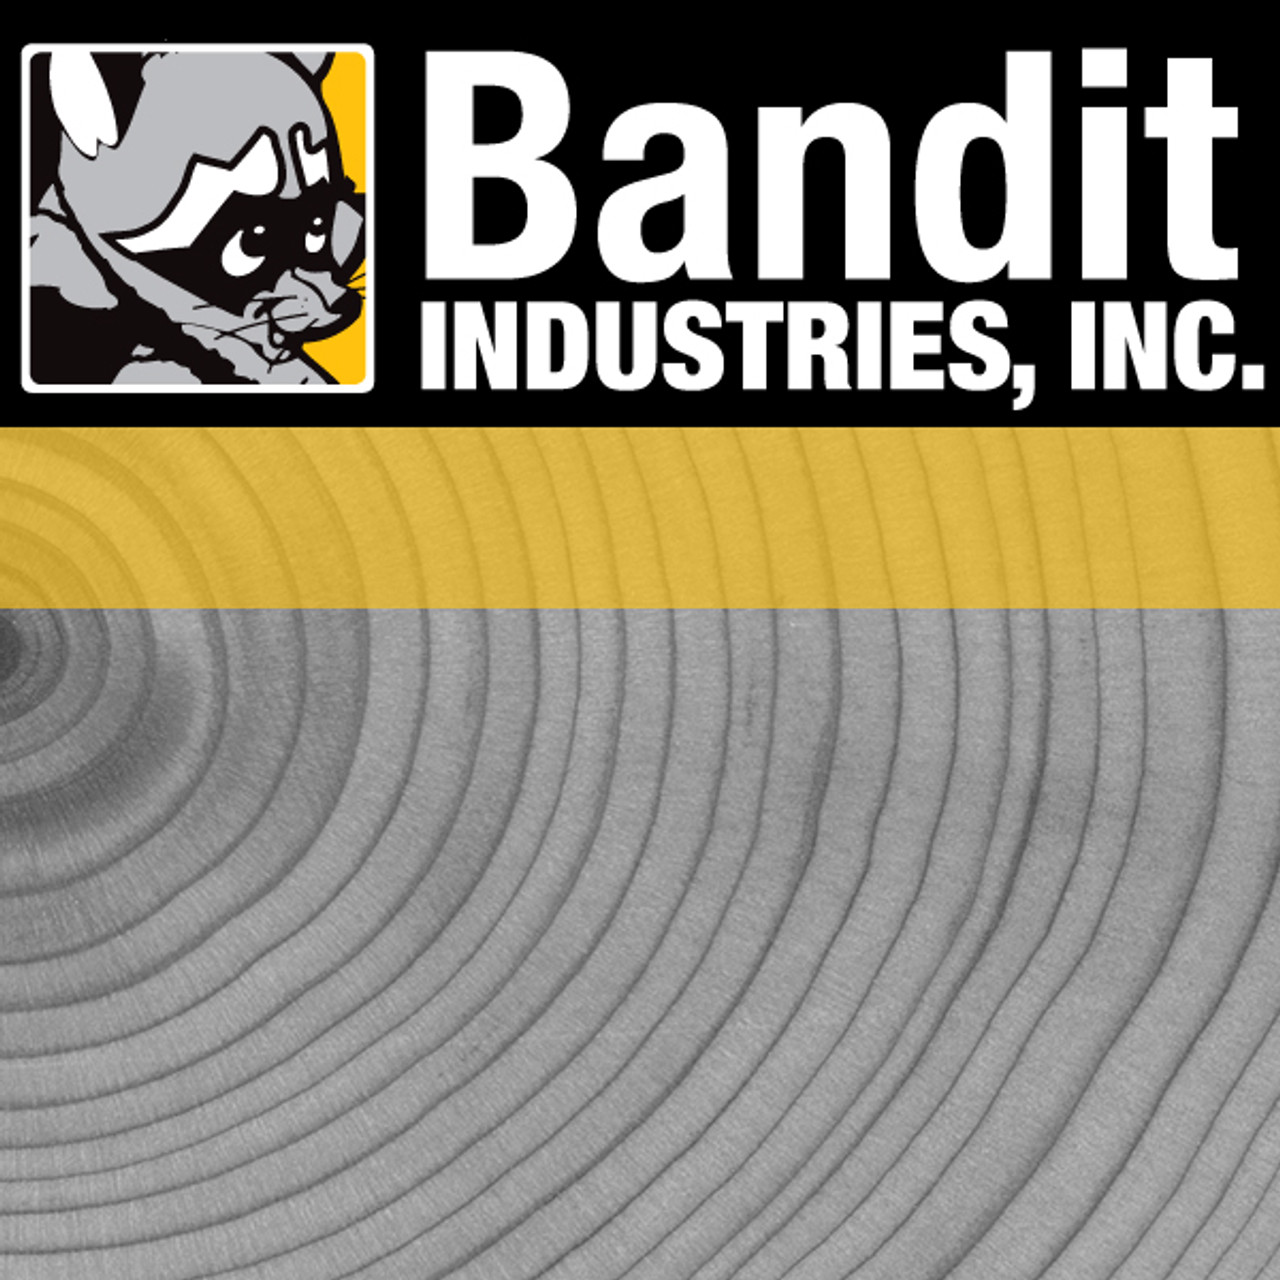 900-2911-57: BANDIT 3 POSITION MOMENTARY TOGGLE SWITCH (MIRITRON TRANSMITT